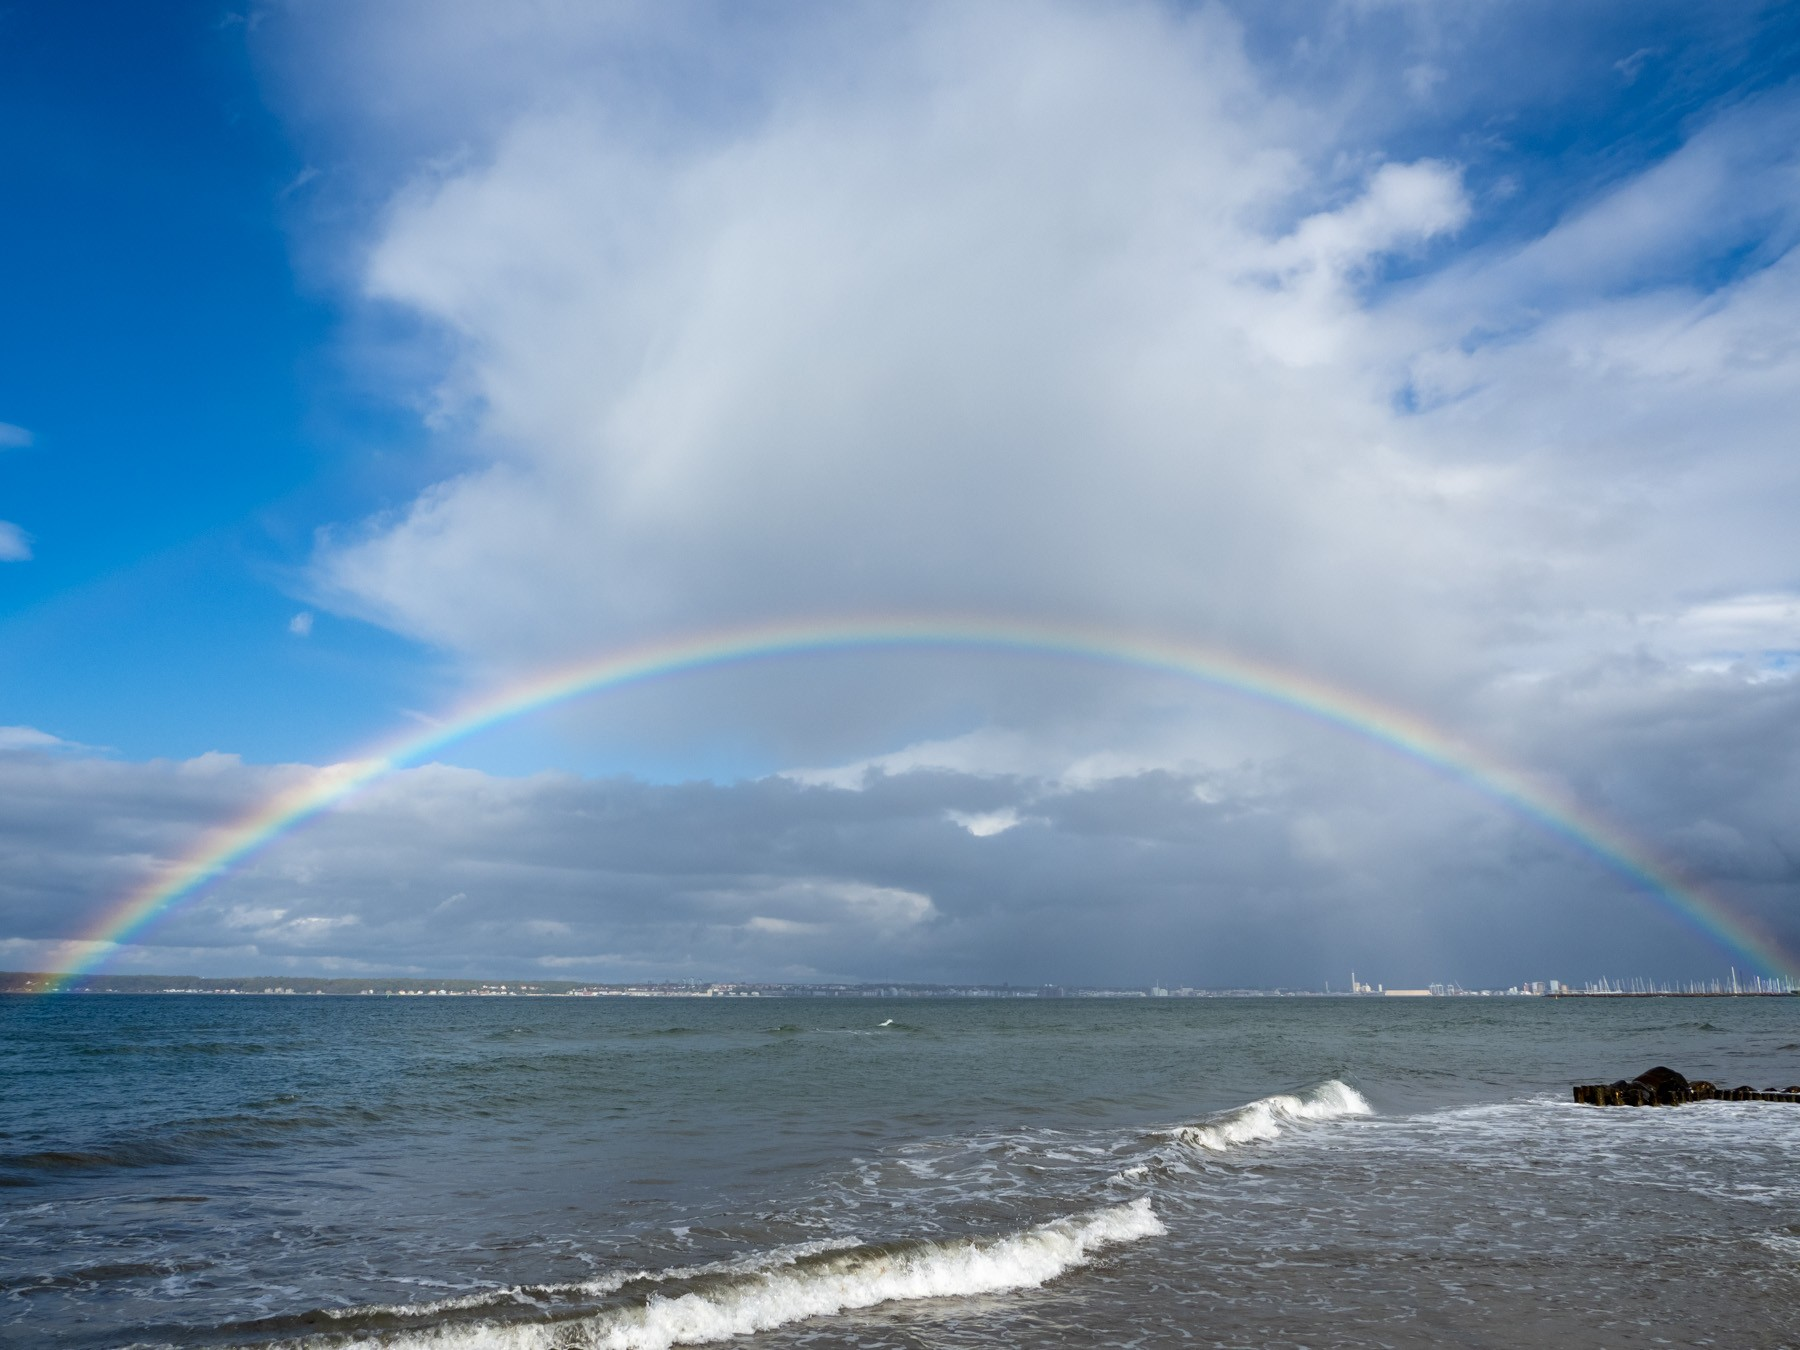 Regnbue over Øresund